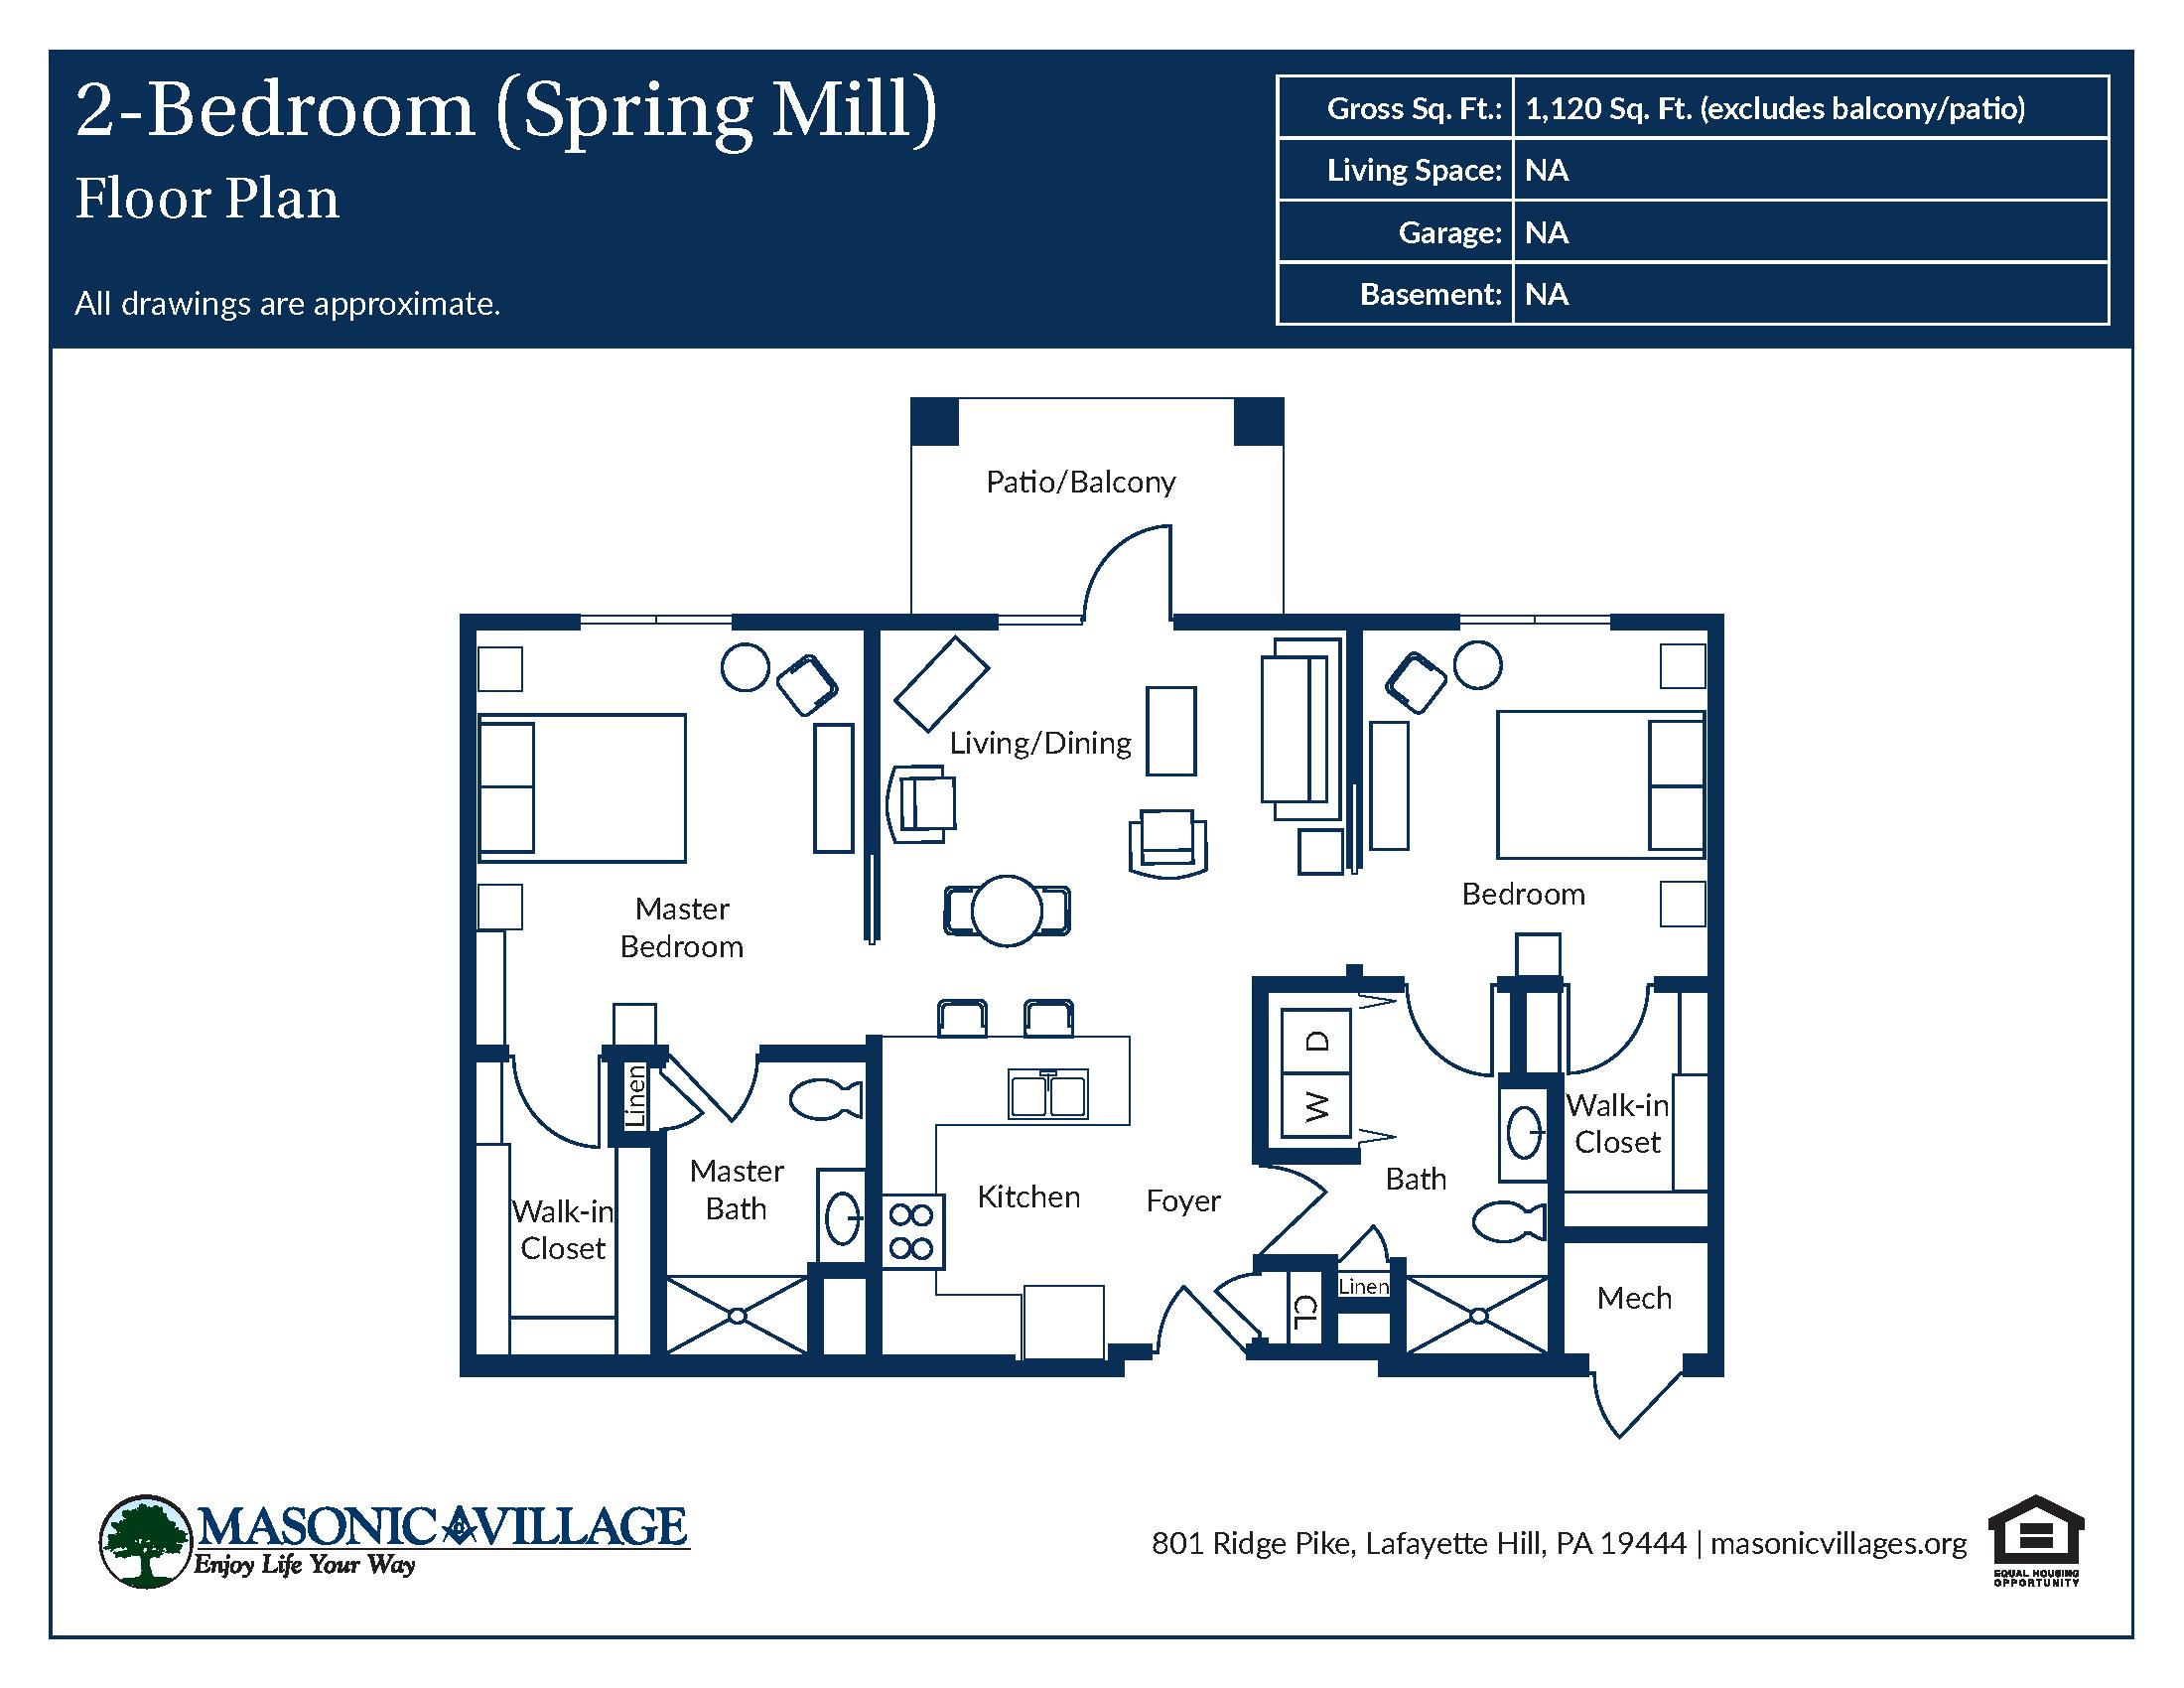 Apartment Type Spring Mill Floor Plan